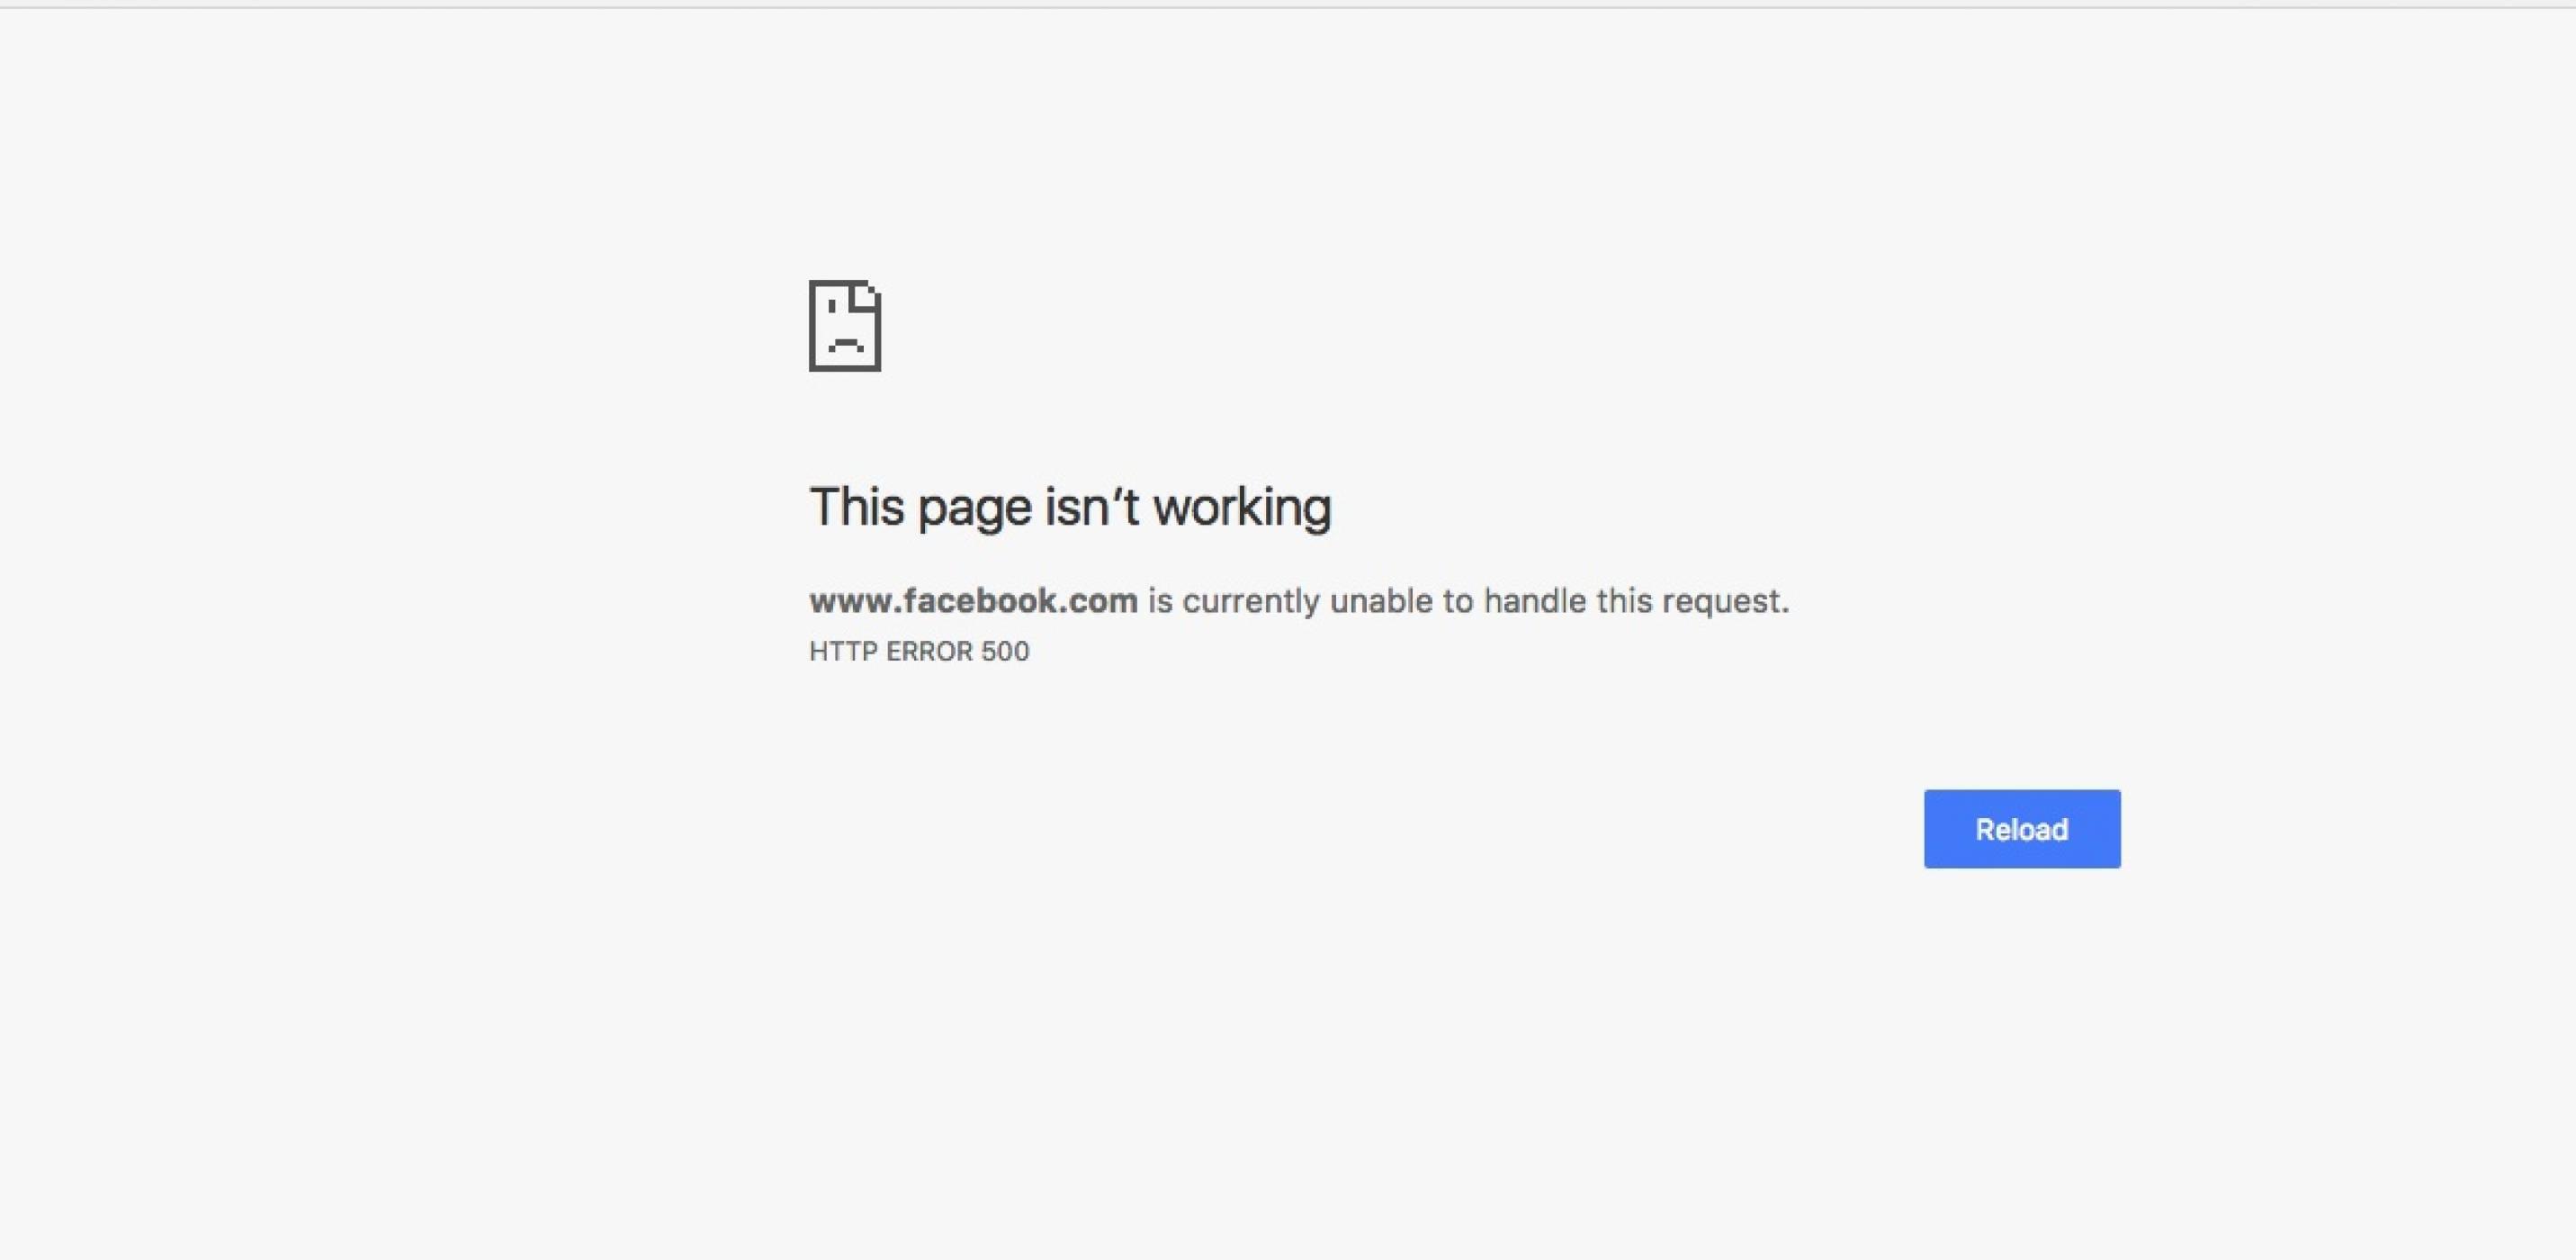 Facebook излезе от строя за потребители по цял свят